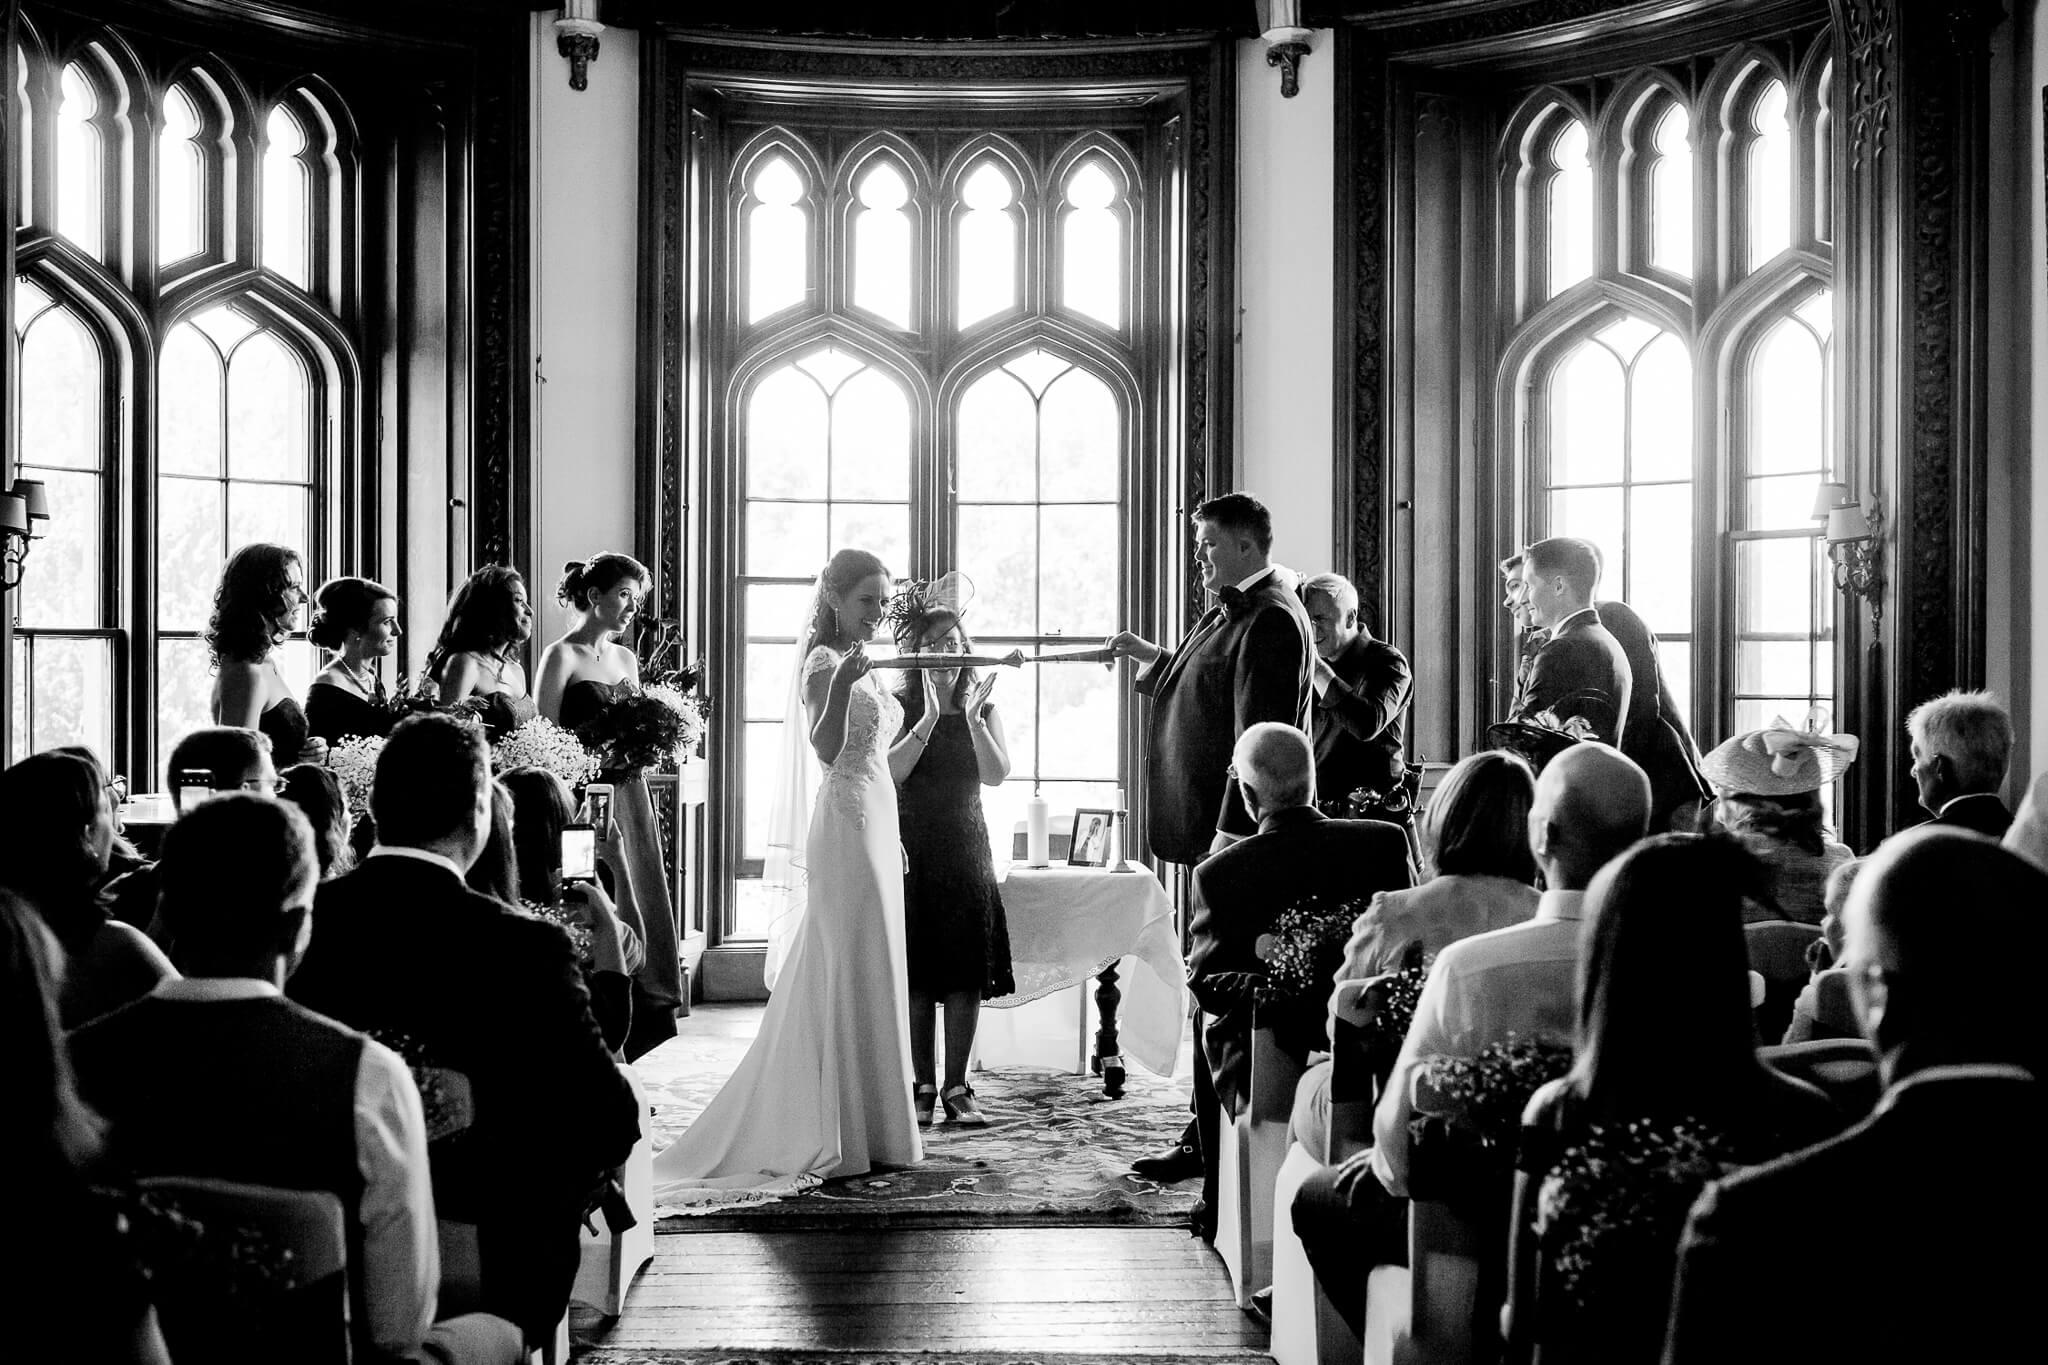 duns-castle-wedding-photograper-scotland-stanbury-photography-011